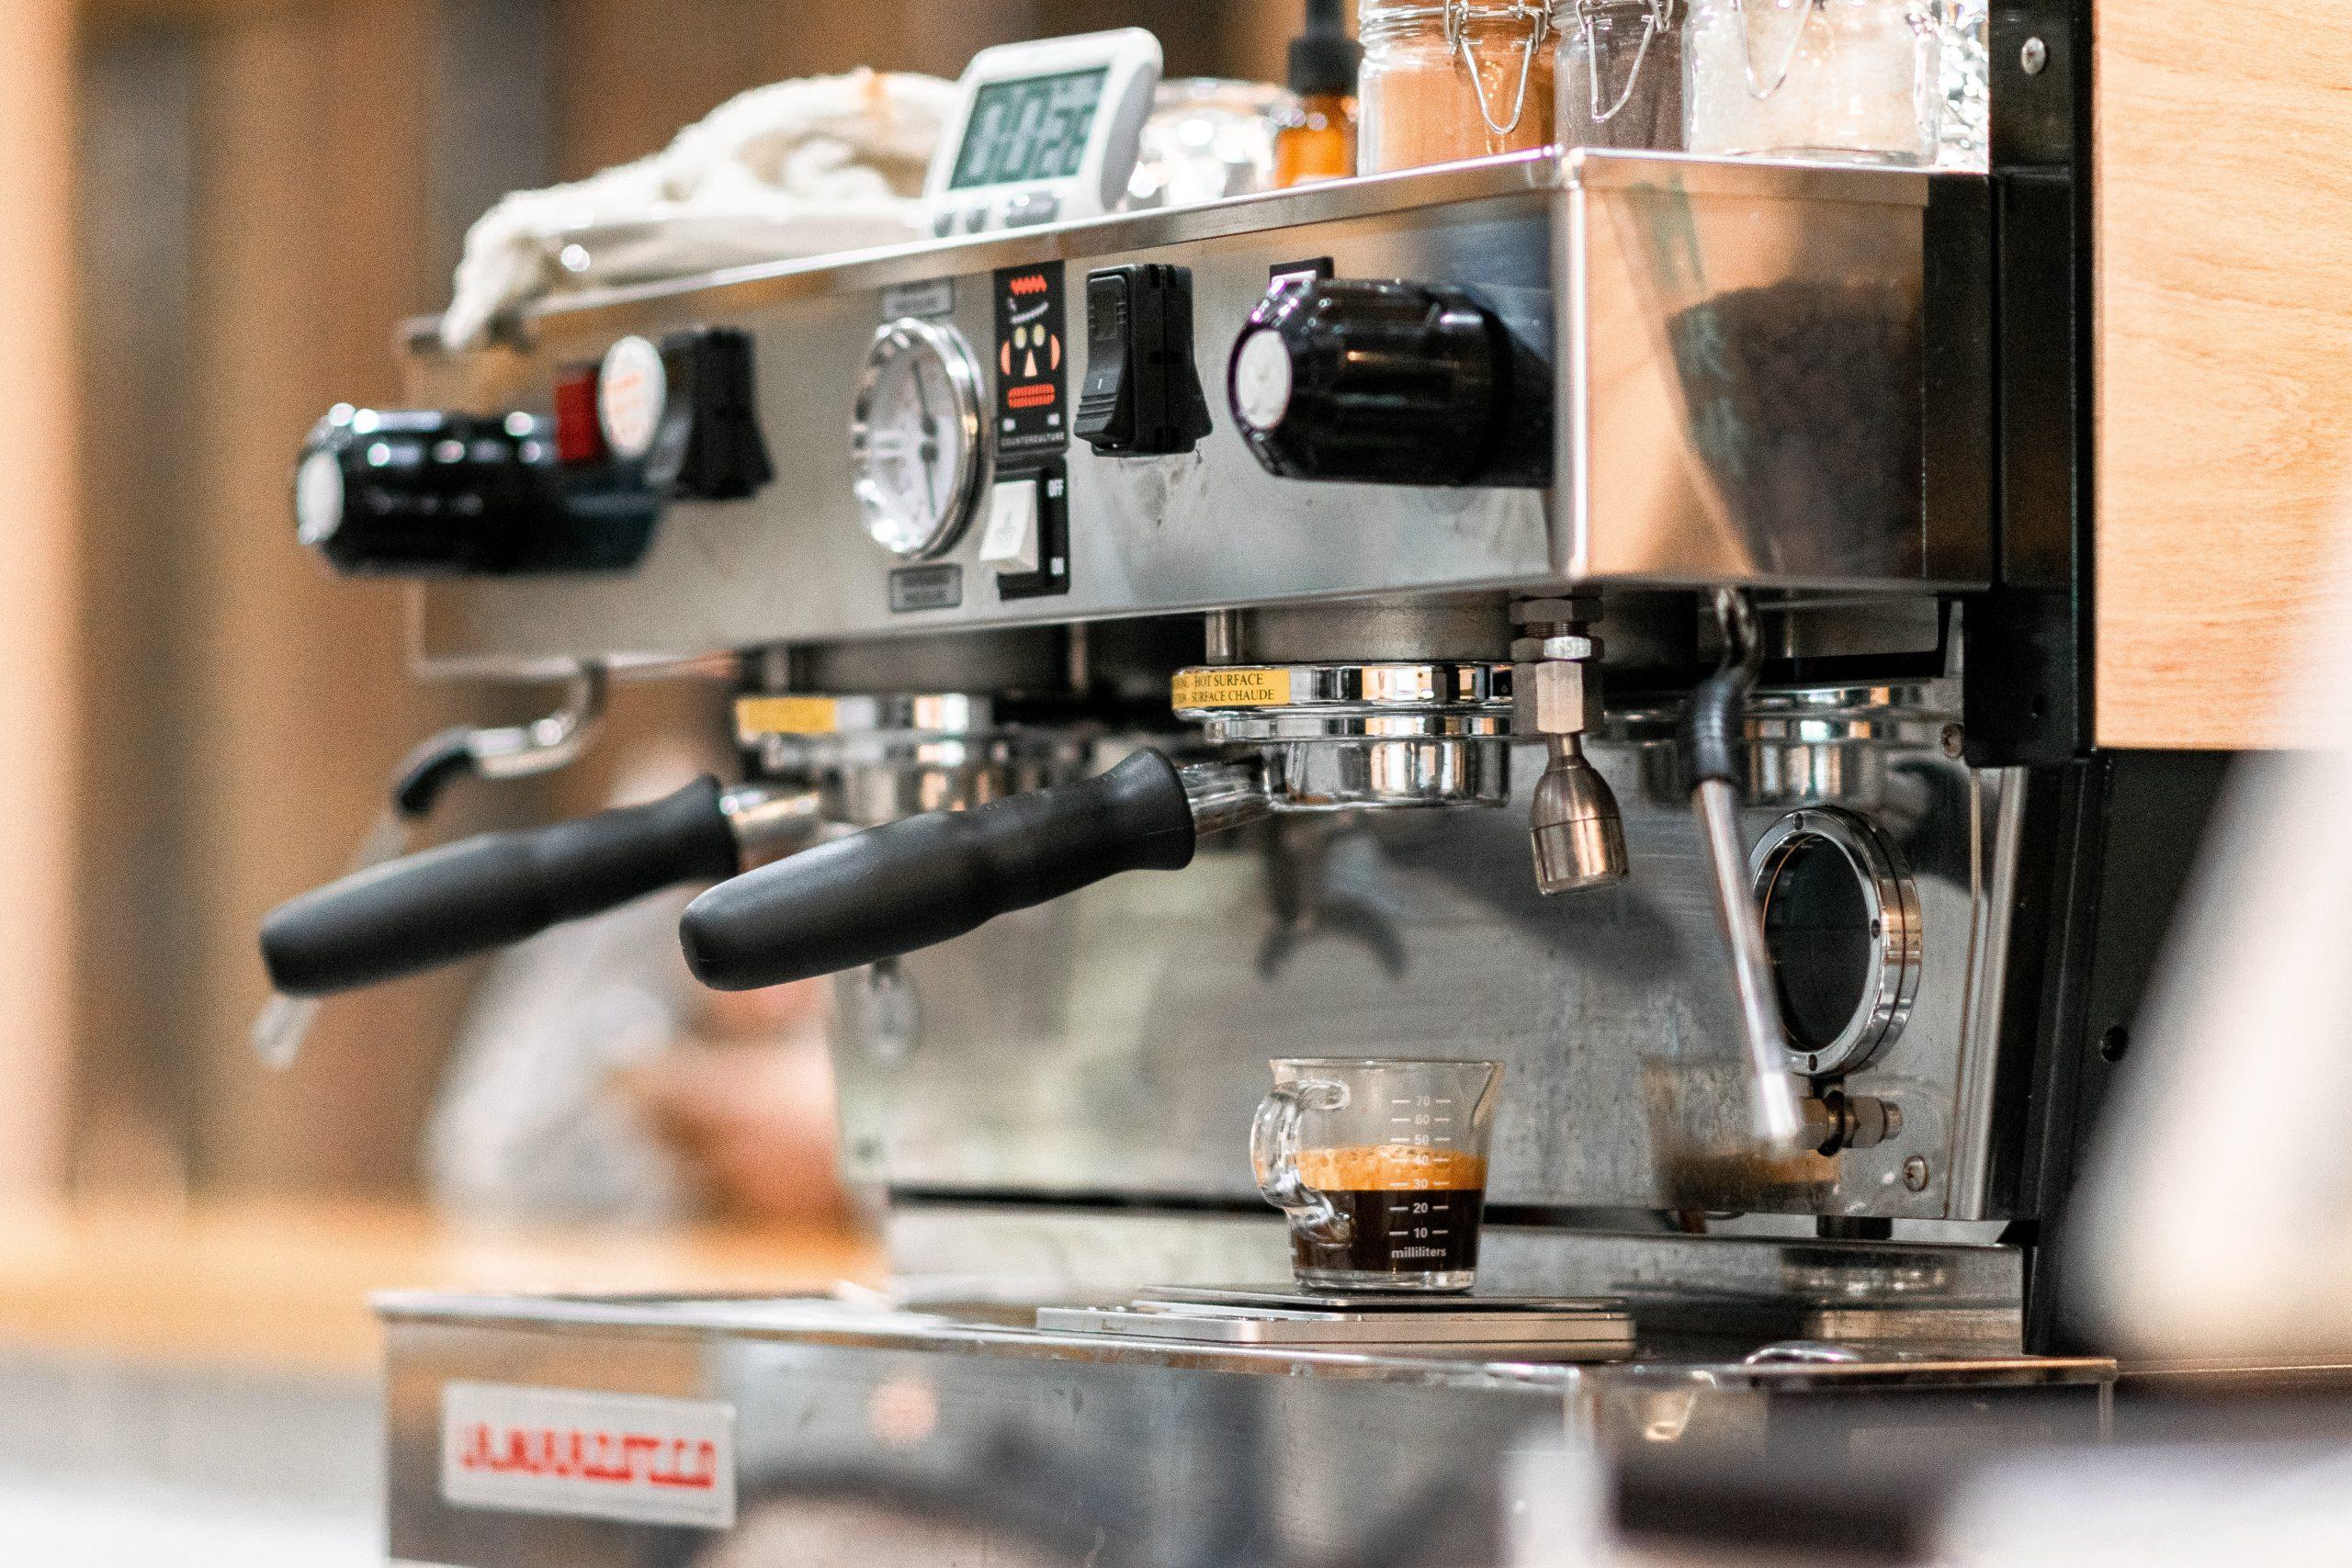 bradley pisney PE3ITnror g unsplash scaled - Skal du købe ny kaffemaskine?